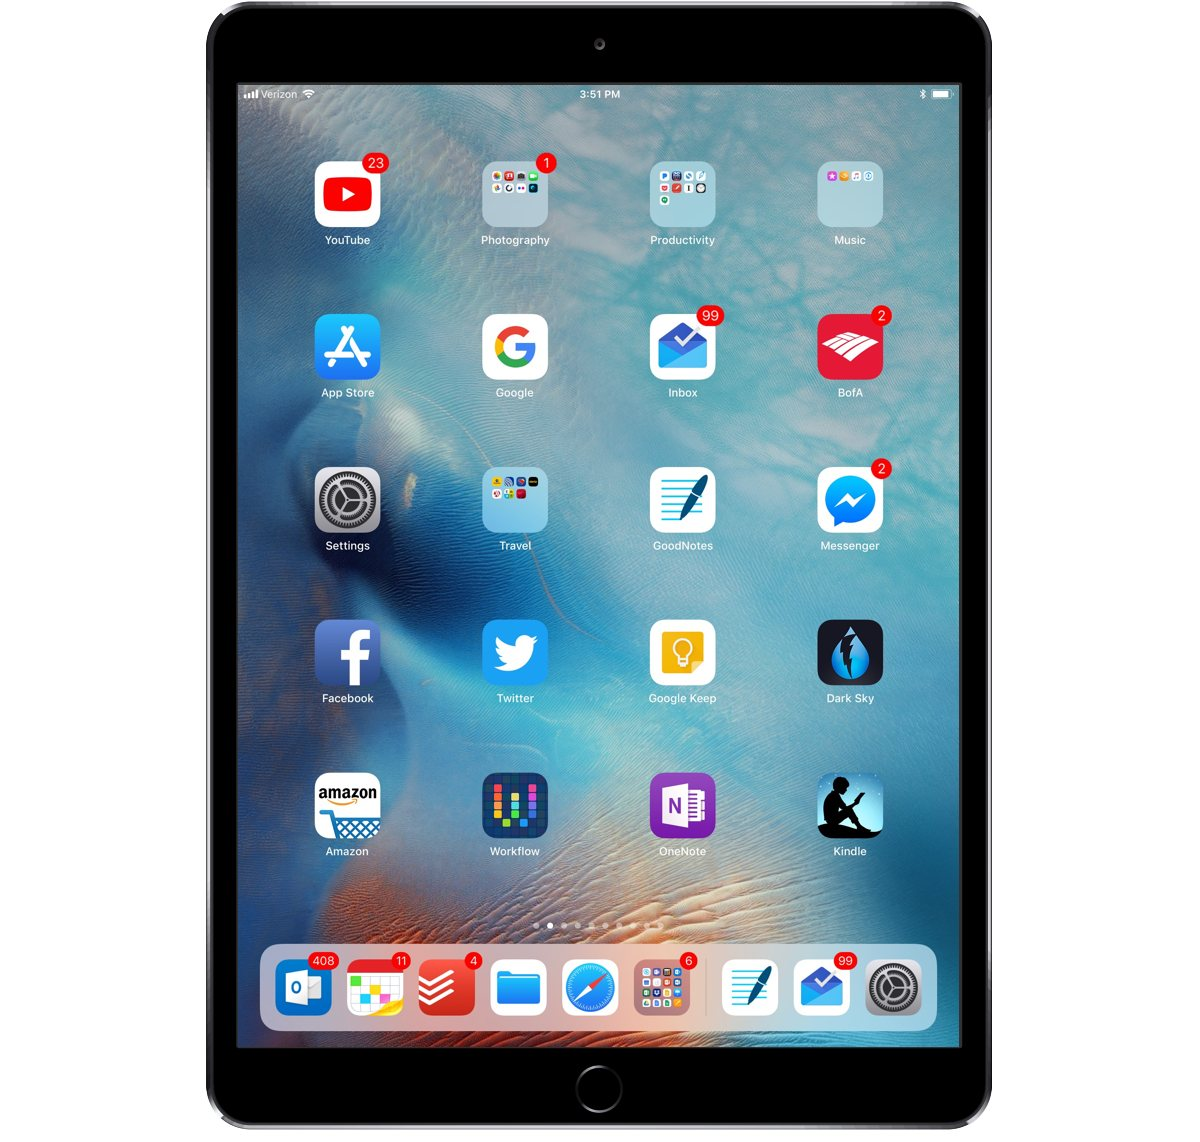 Joan Erwin's iPad setup